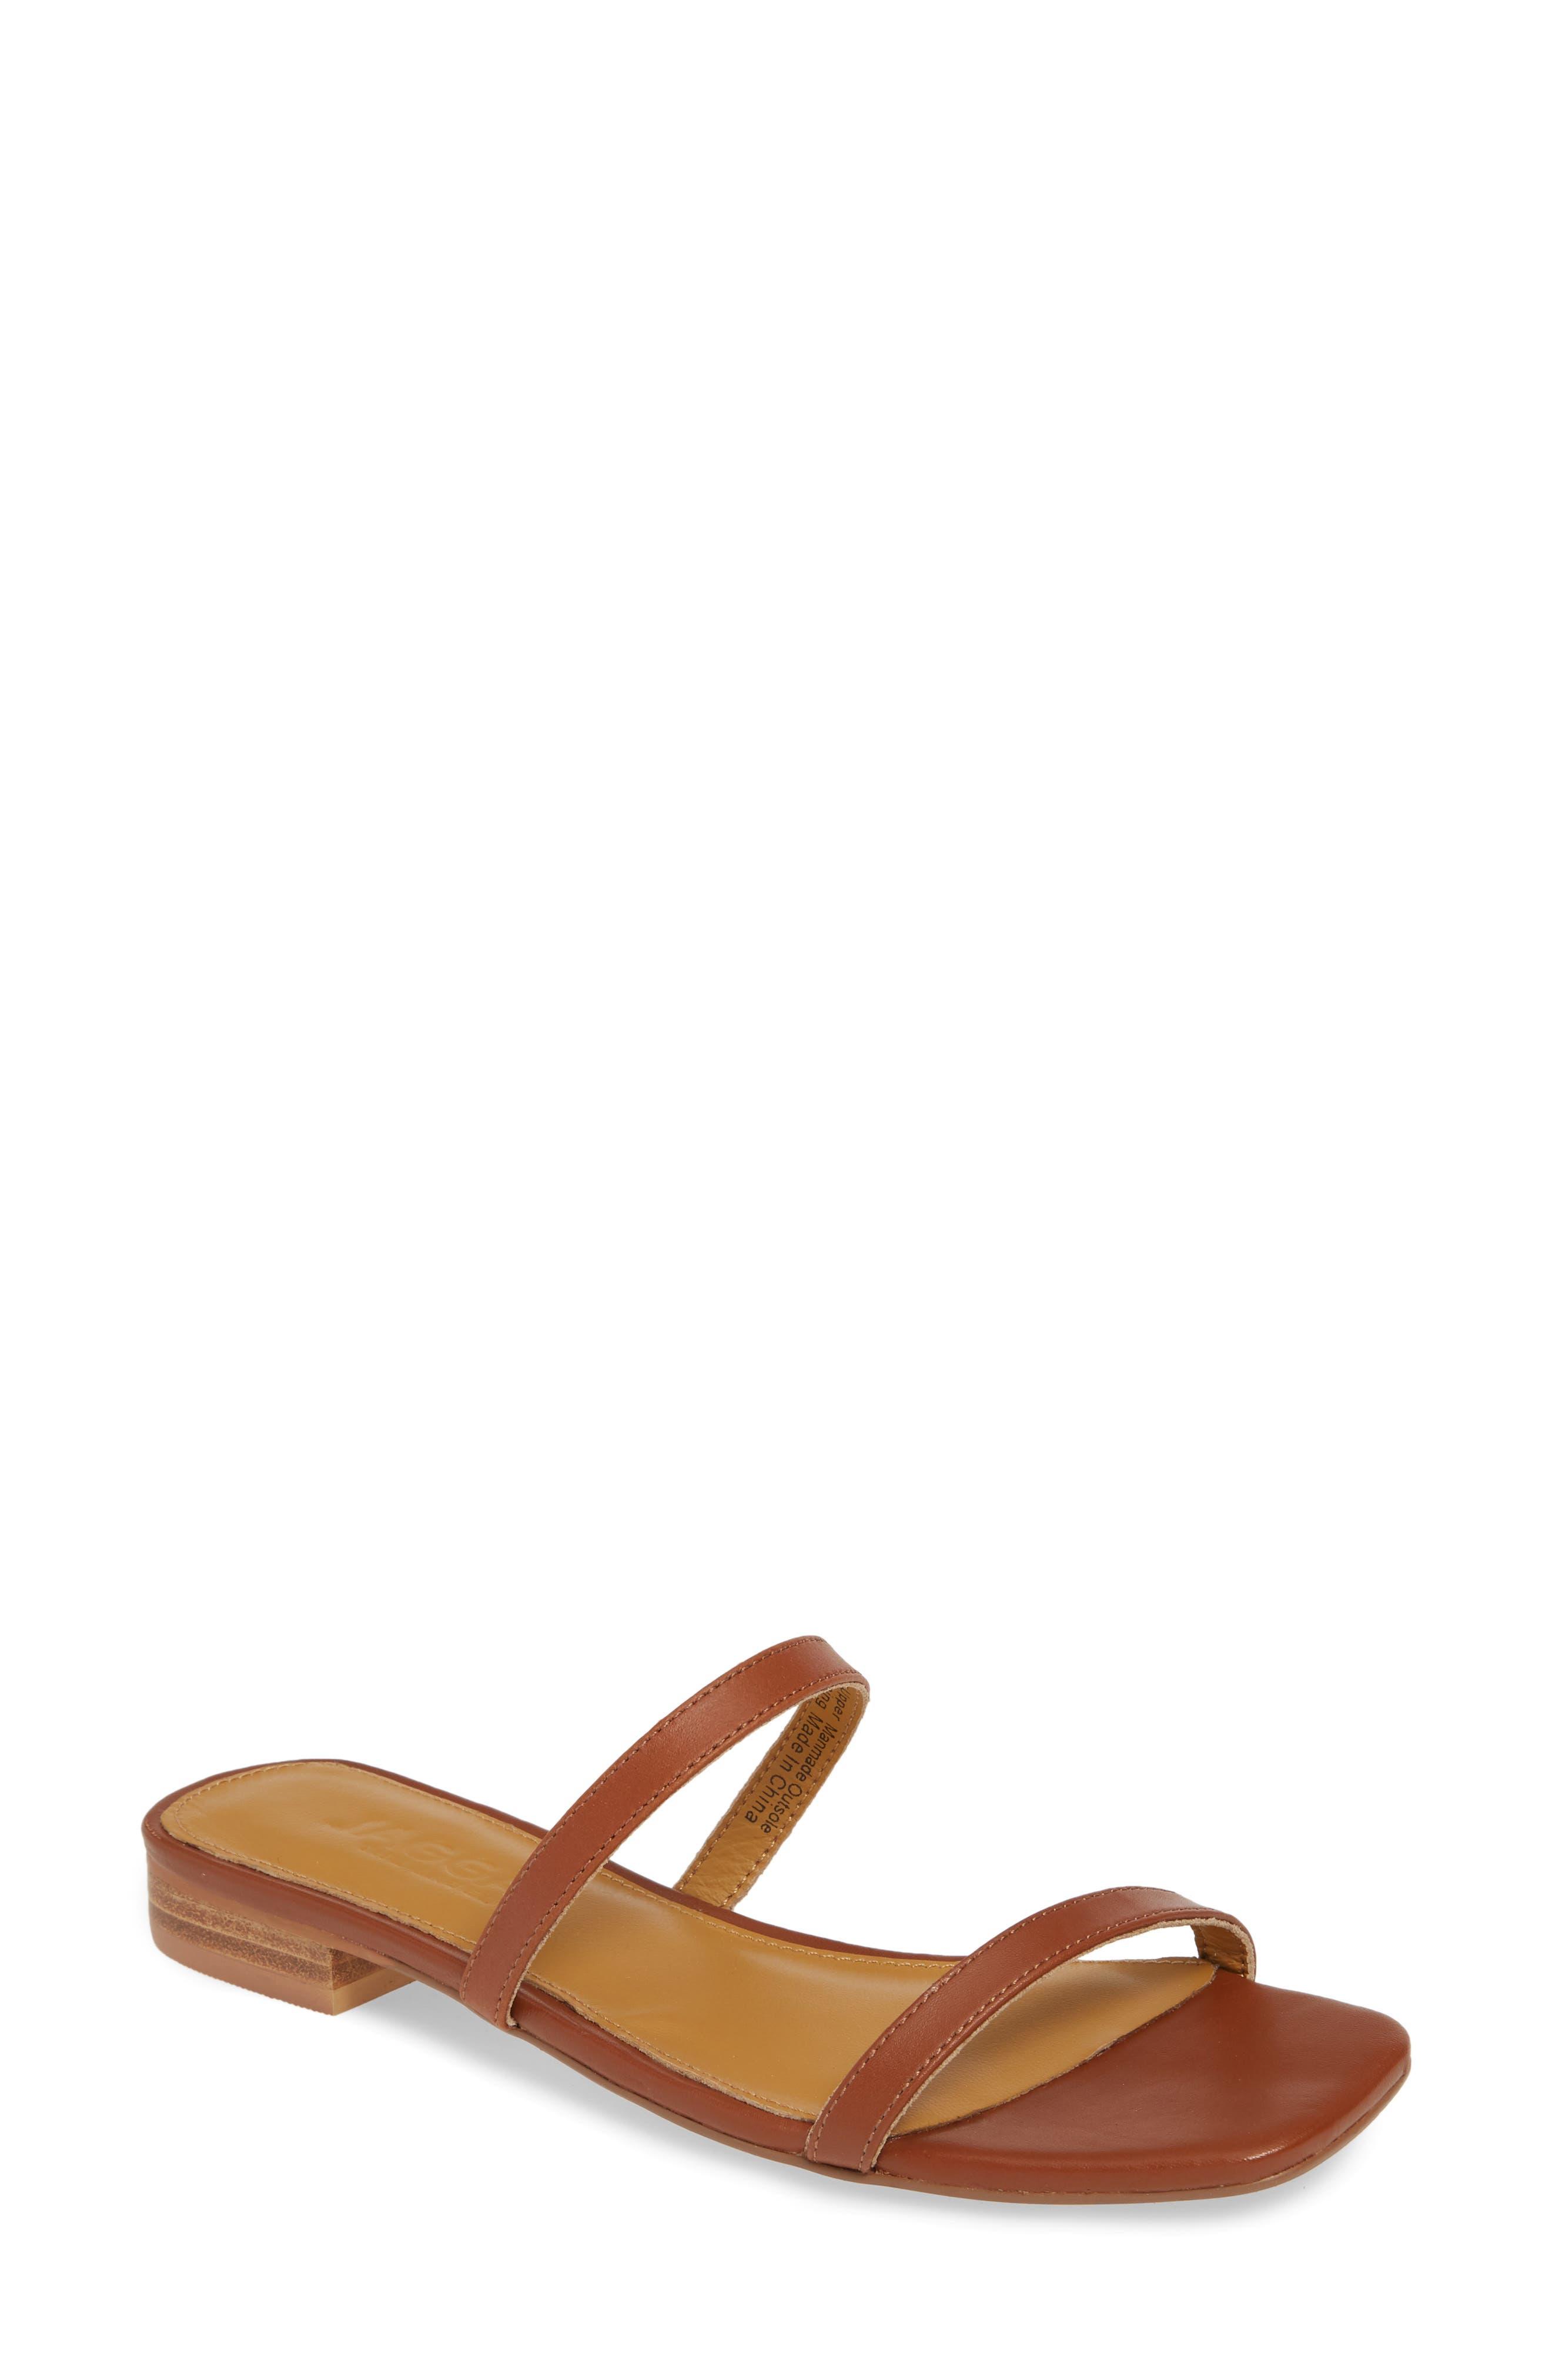 Sprung Slide Sandal, Main, color, RUST LEATHER